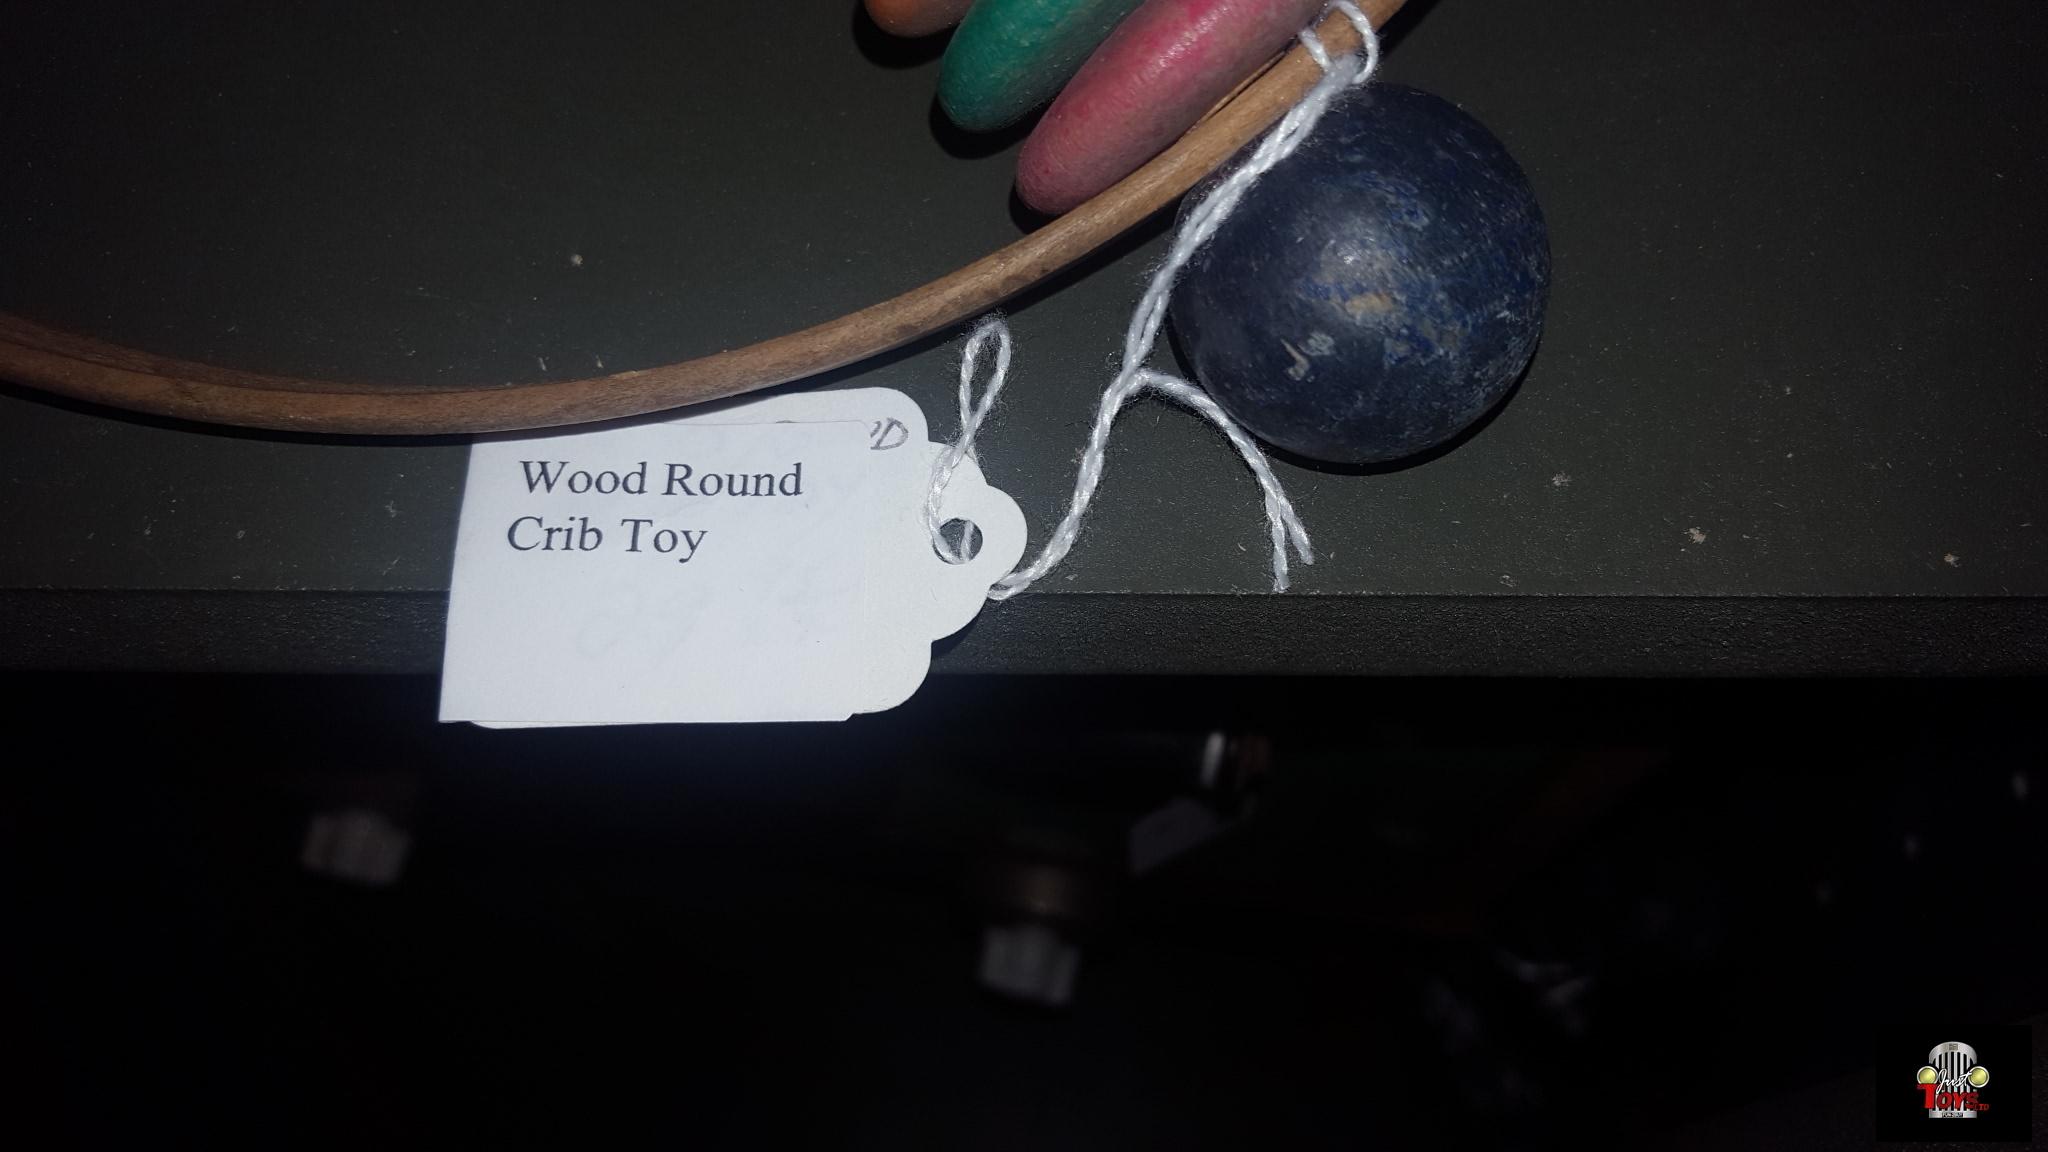 Wood Round Crib Toy